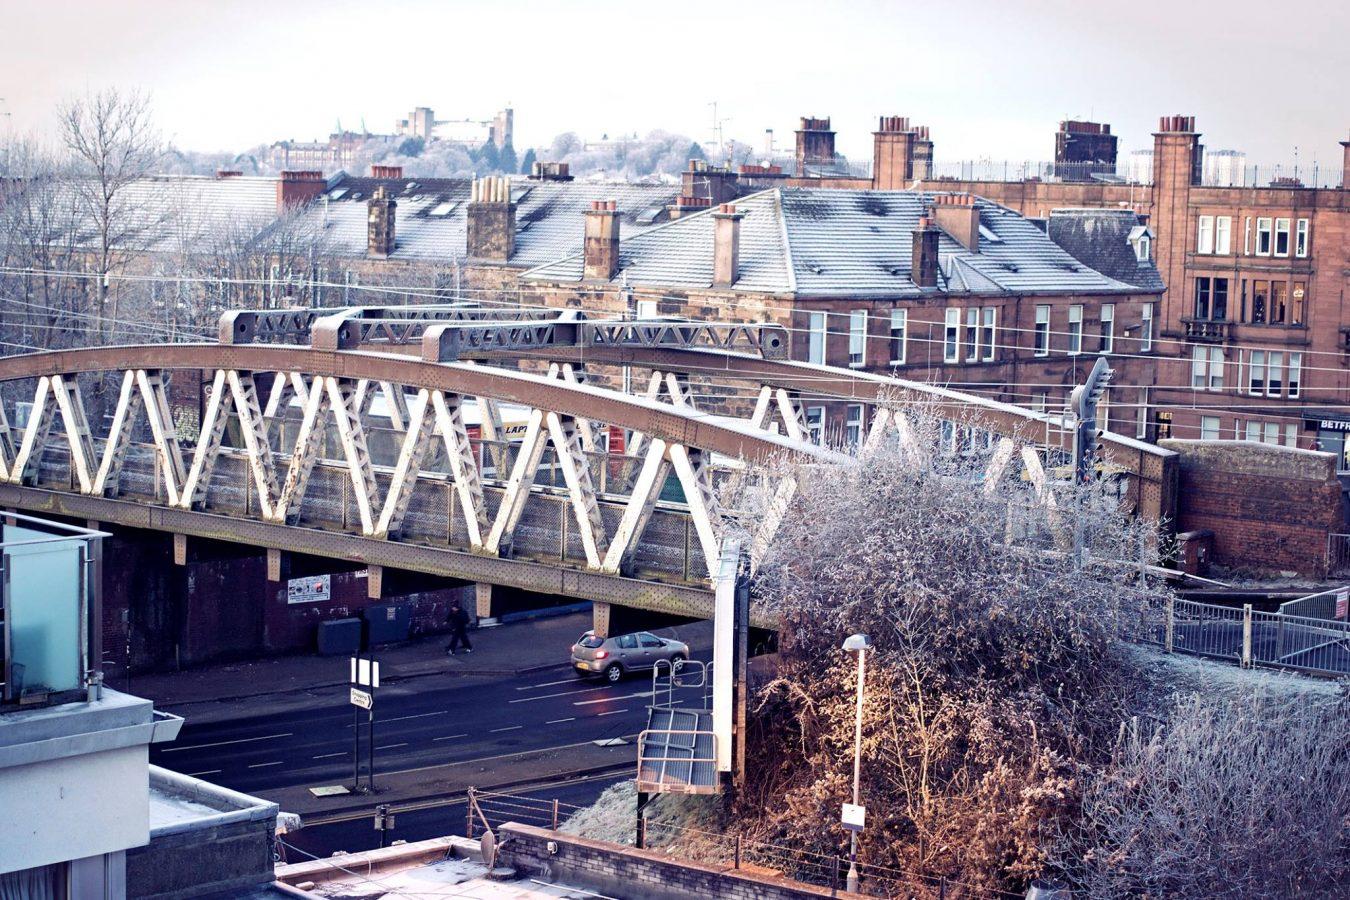 Anniesland Tenements and Railway Bridge